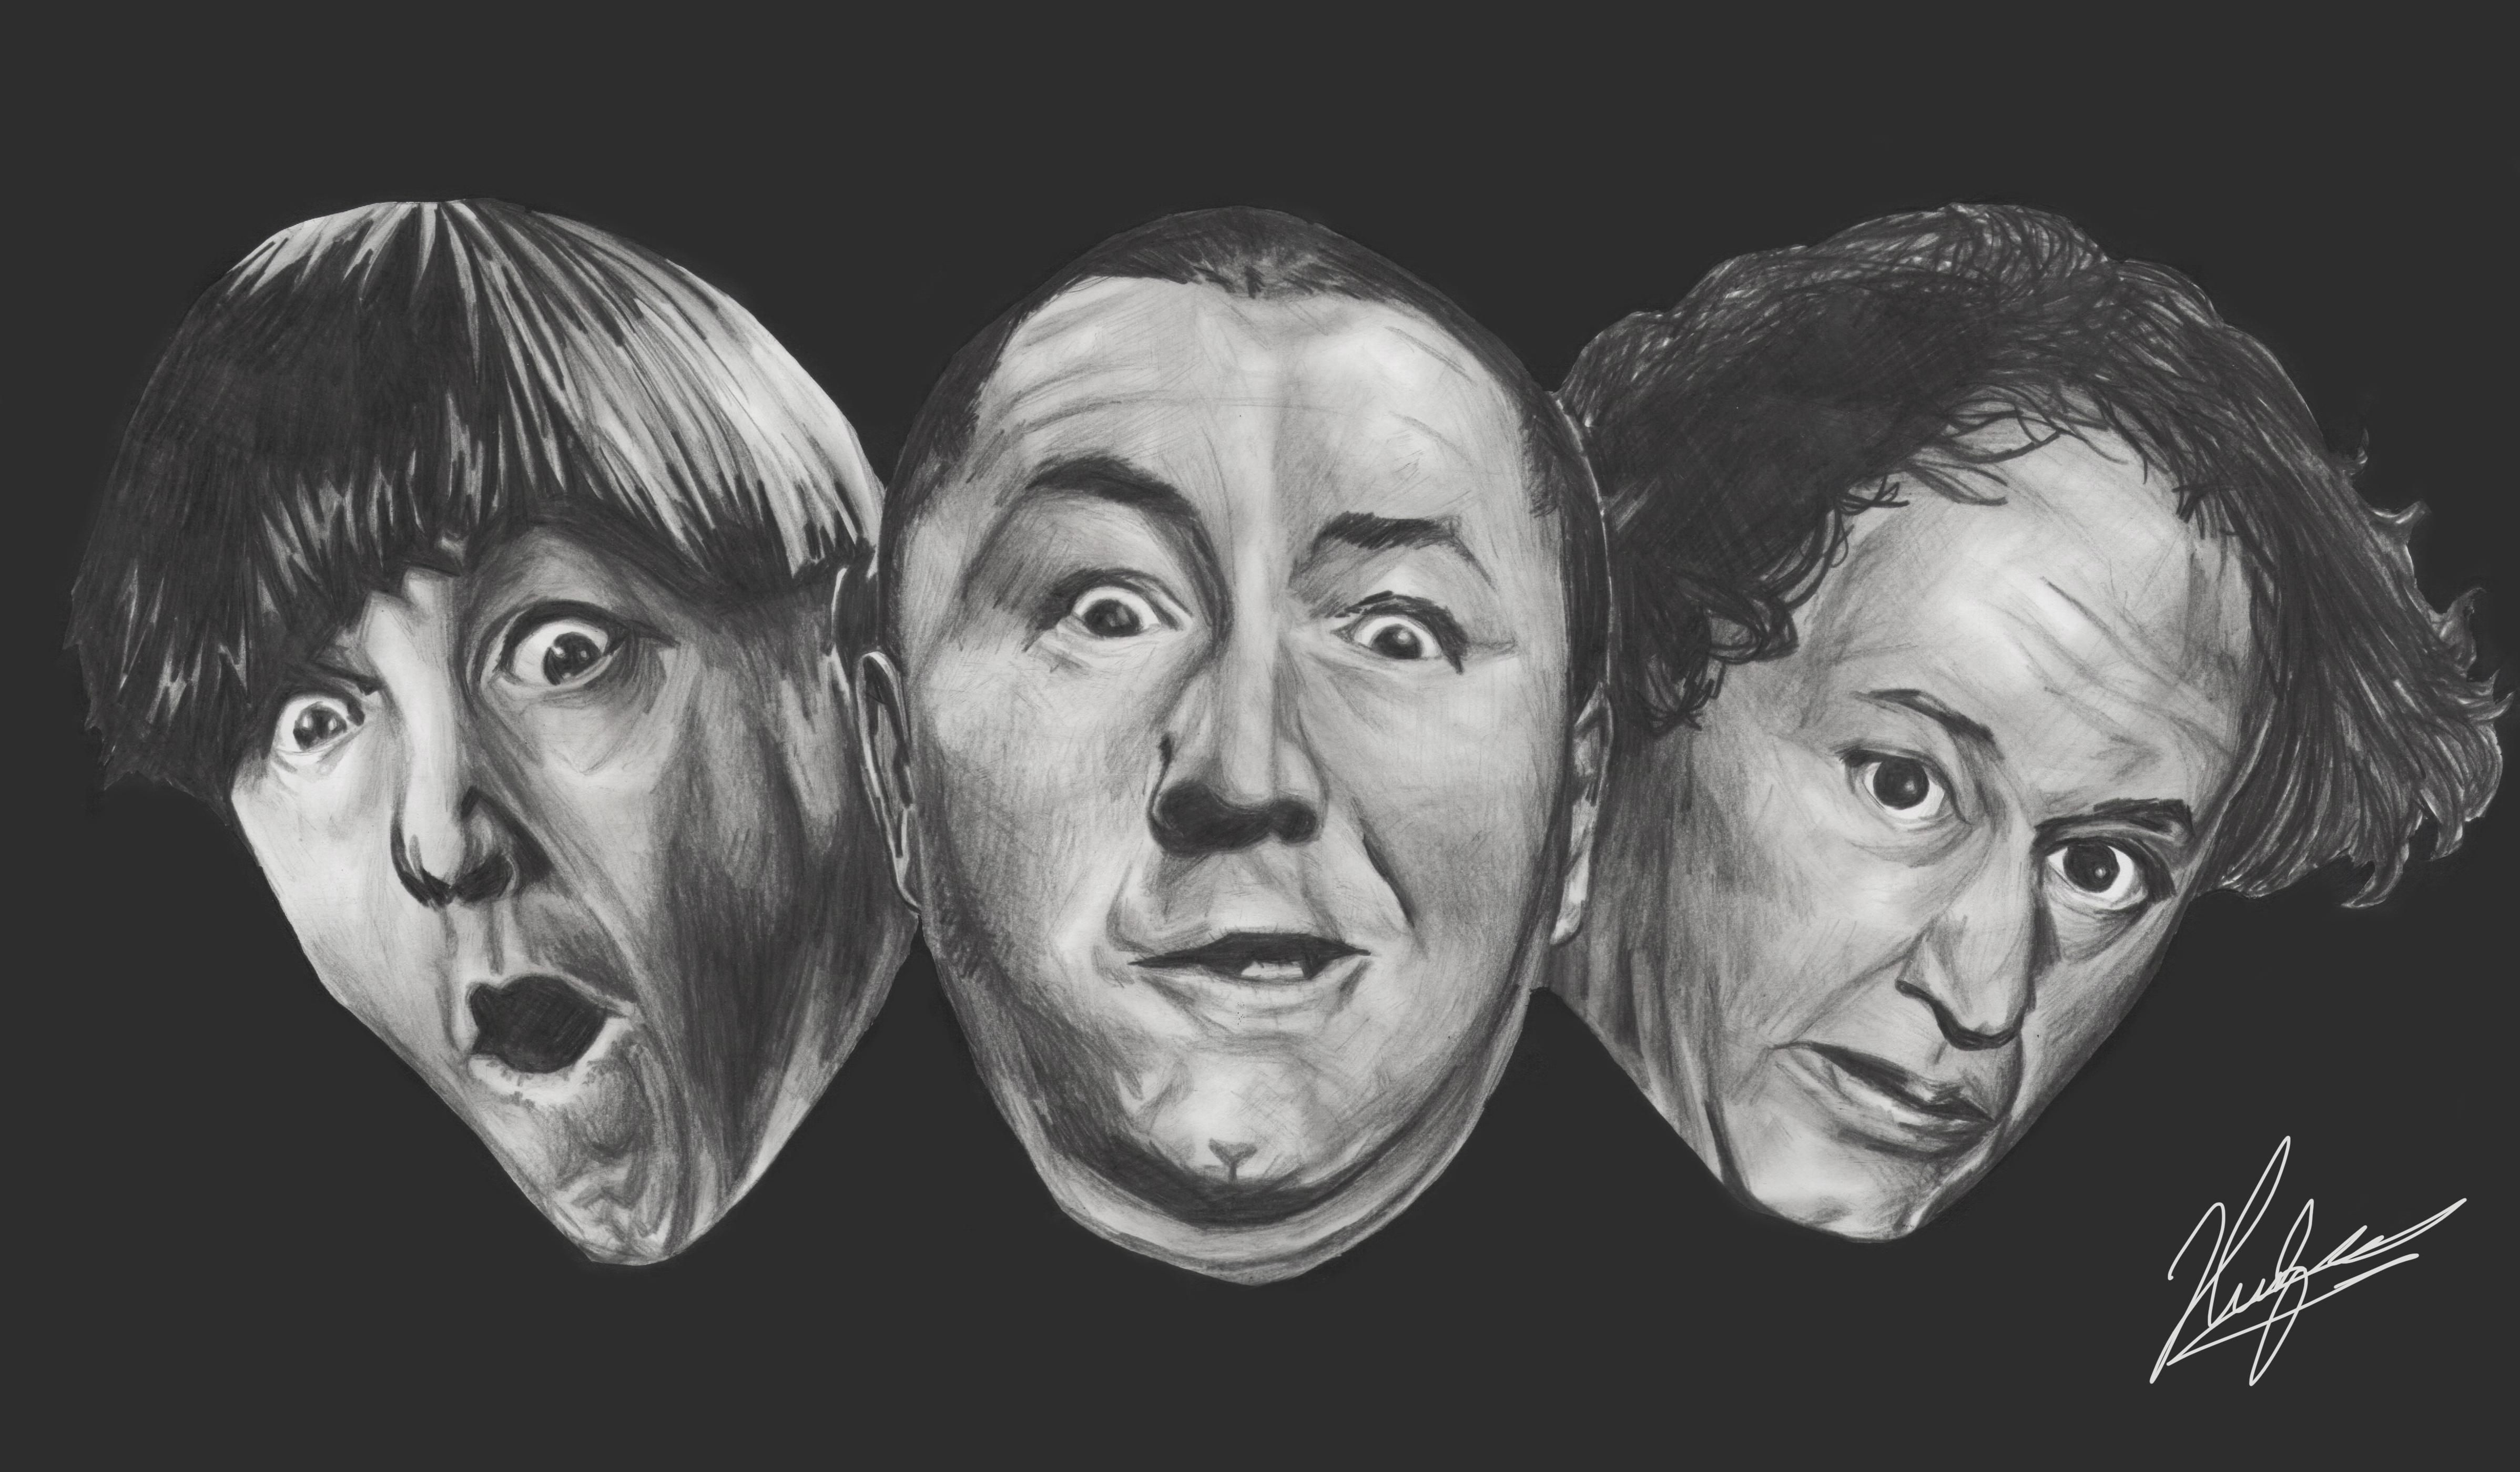 three stooges desktop wallpaper labzada wallpaper